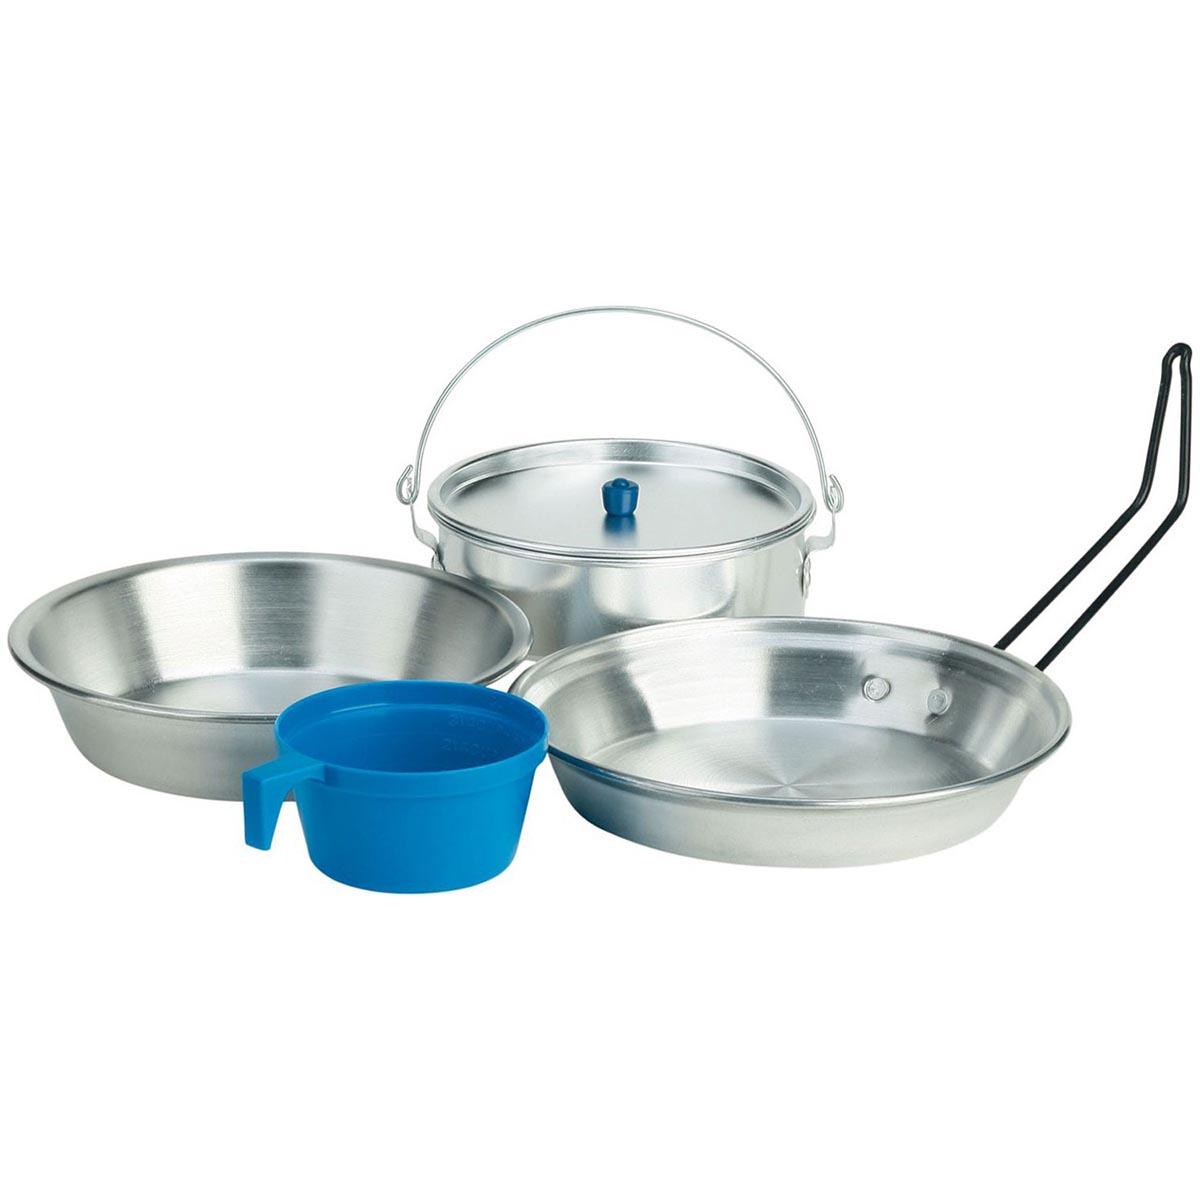 Ferrino Popote Mono Yemek Pişirme Seti FER-78040